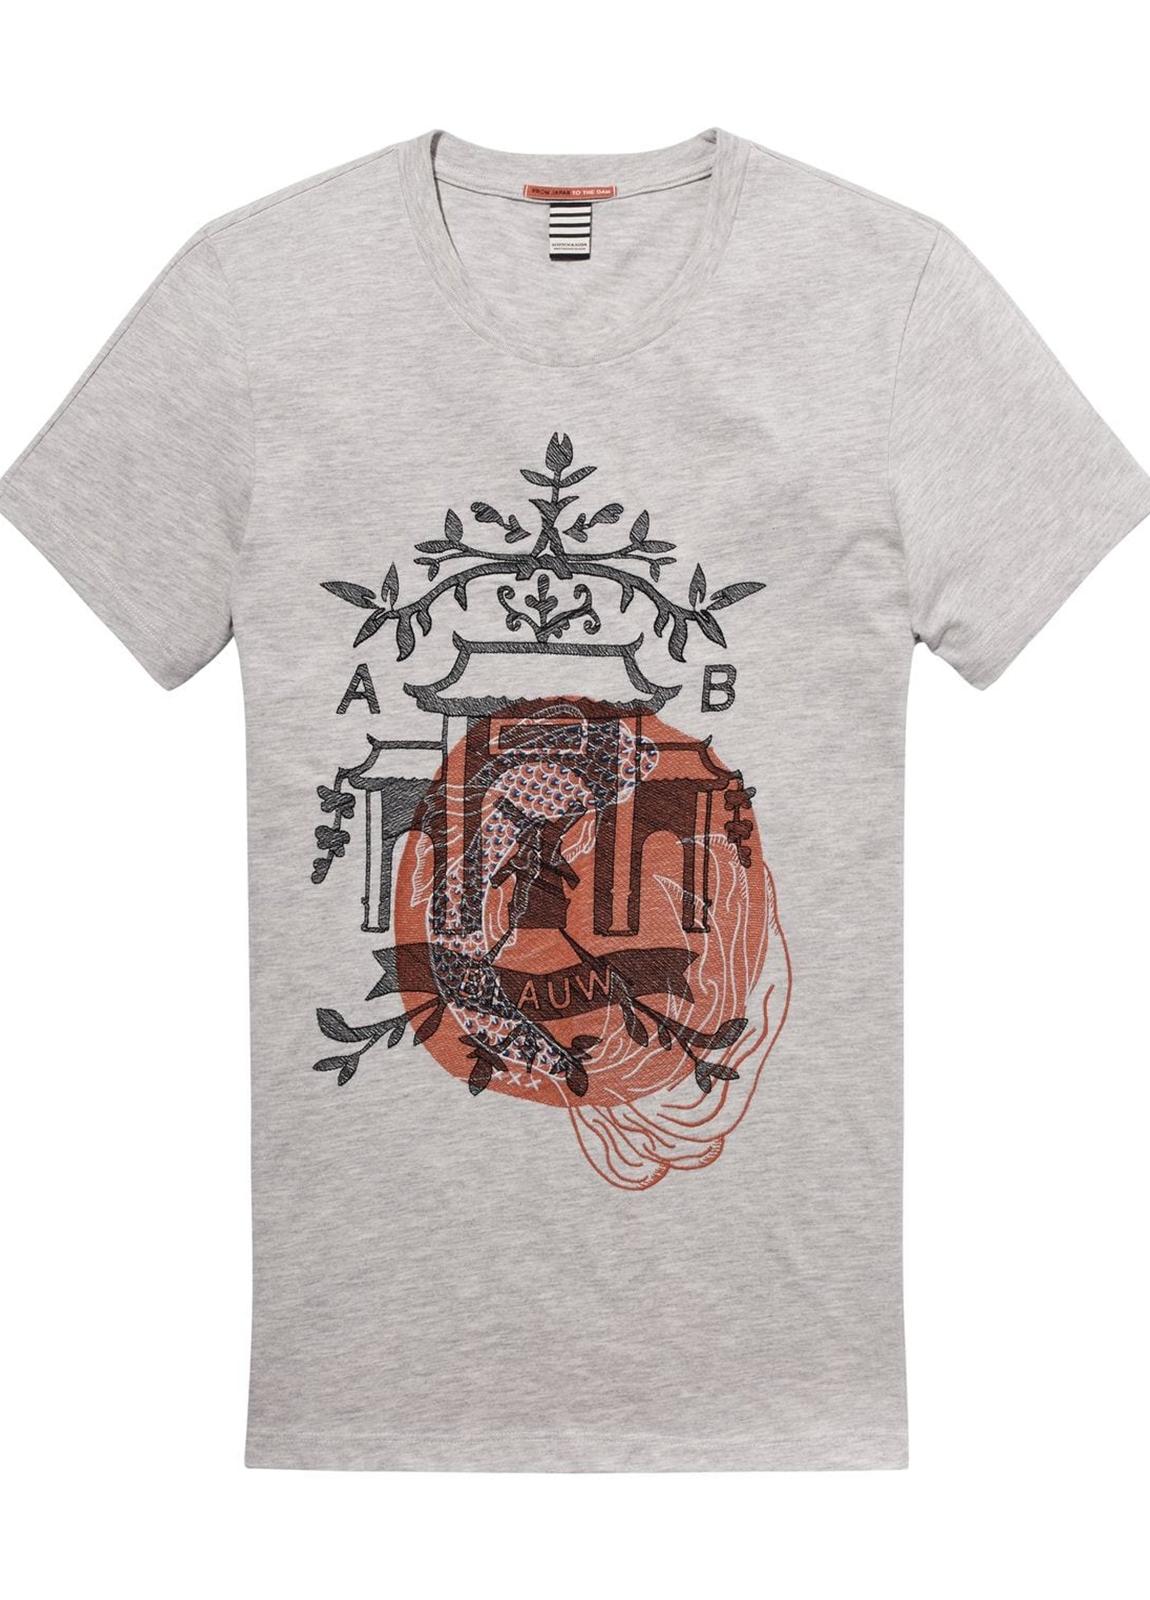 Camiseta manga corta color gris jaspeado con estampado gráfico. - Ítem1